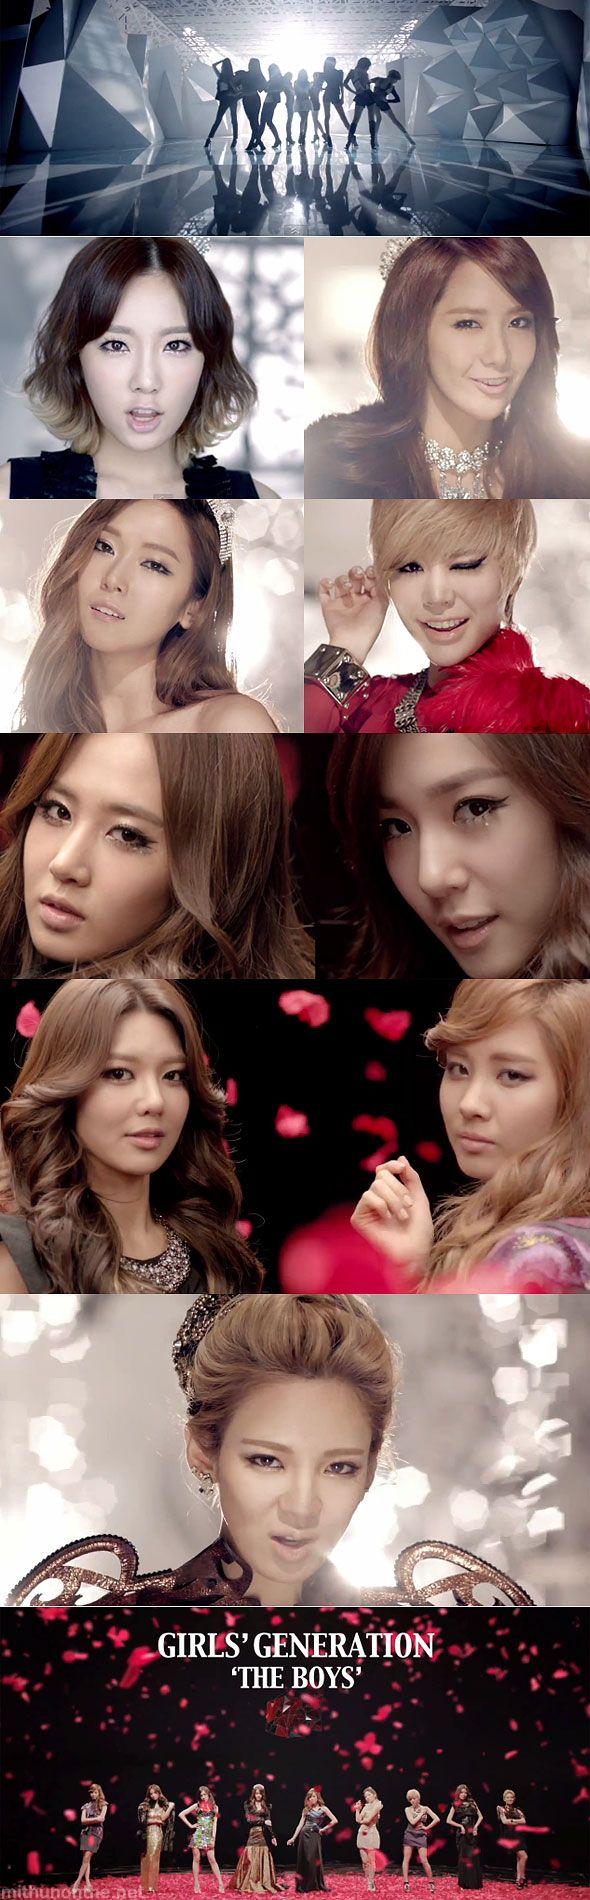 The Boys MV screencaps members http://mithunonthe.net/2011/10/20/girls-generation-the-boys-review-new-album-snsd-korean/ #snsd #girlsgeneration #kpop